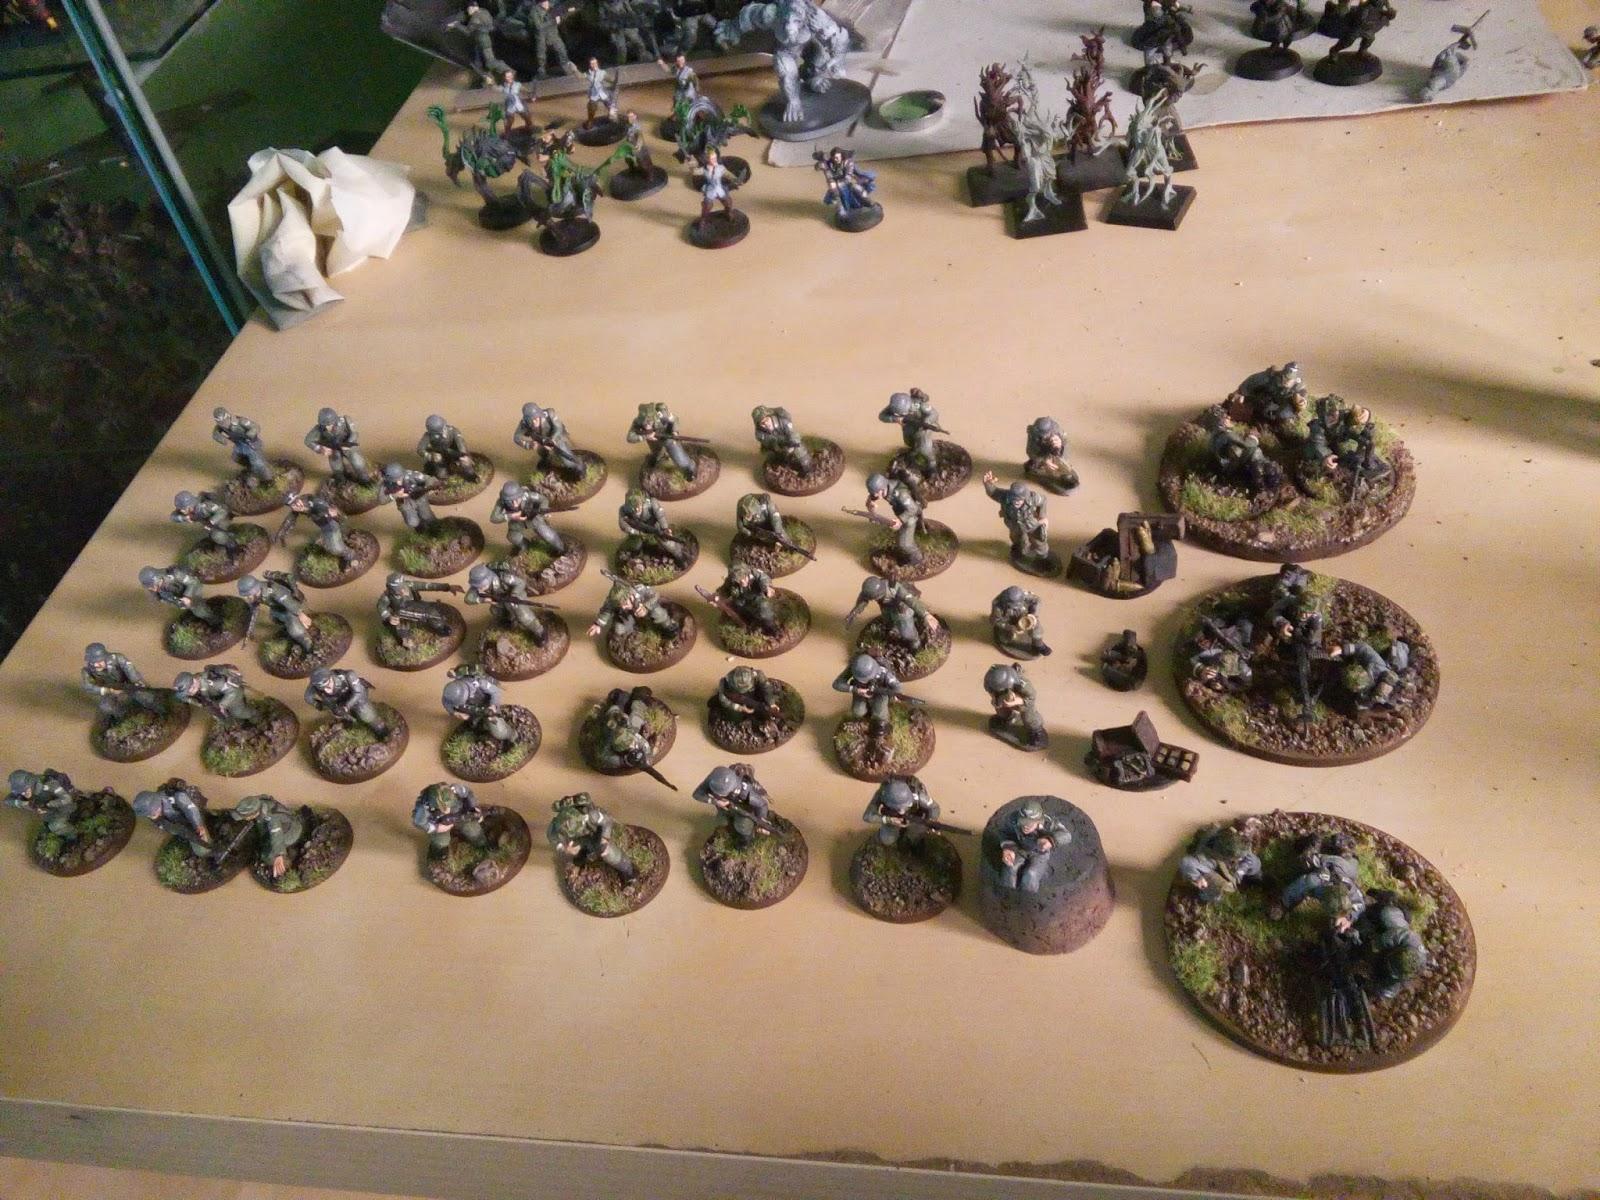 Eclectic aplumb m s trabajo como pintor mercenario en for Gears of war juego de mesa